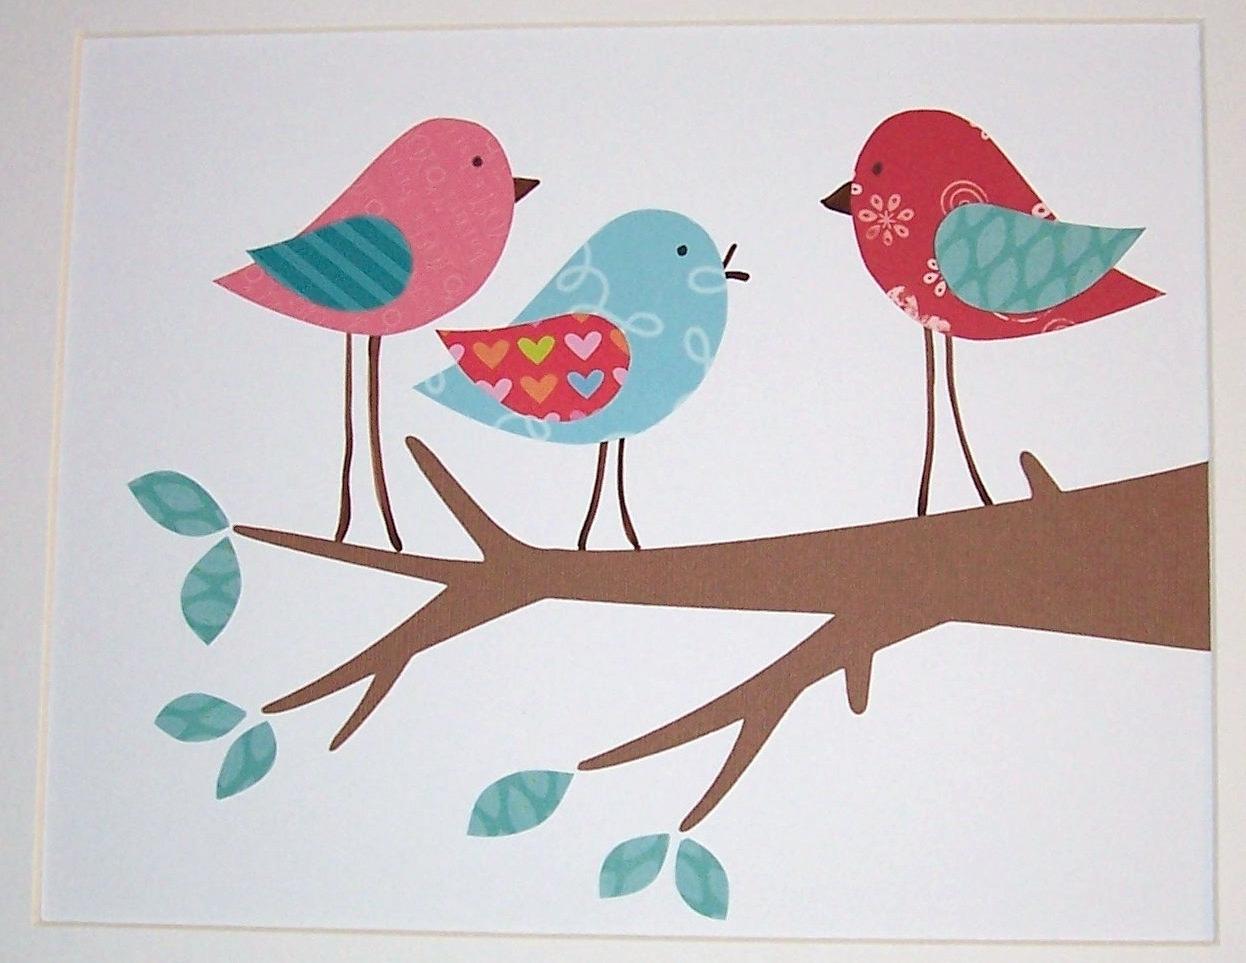 Most Current Red And Turquoise Wall Art Regarding Nursery Art, Kids Wall Art, Children's Room Decor, Birds, Aqua (View 11 of 15)